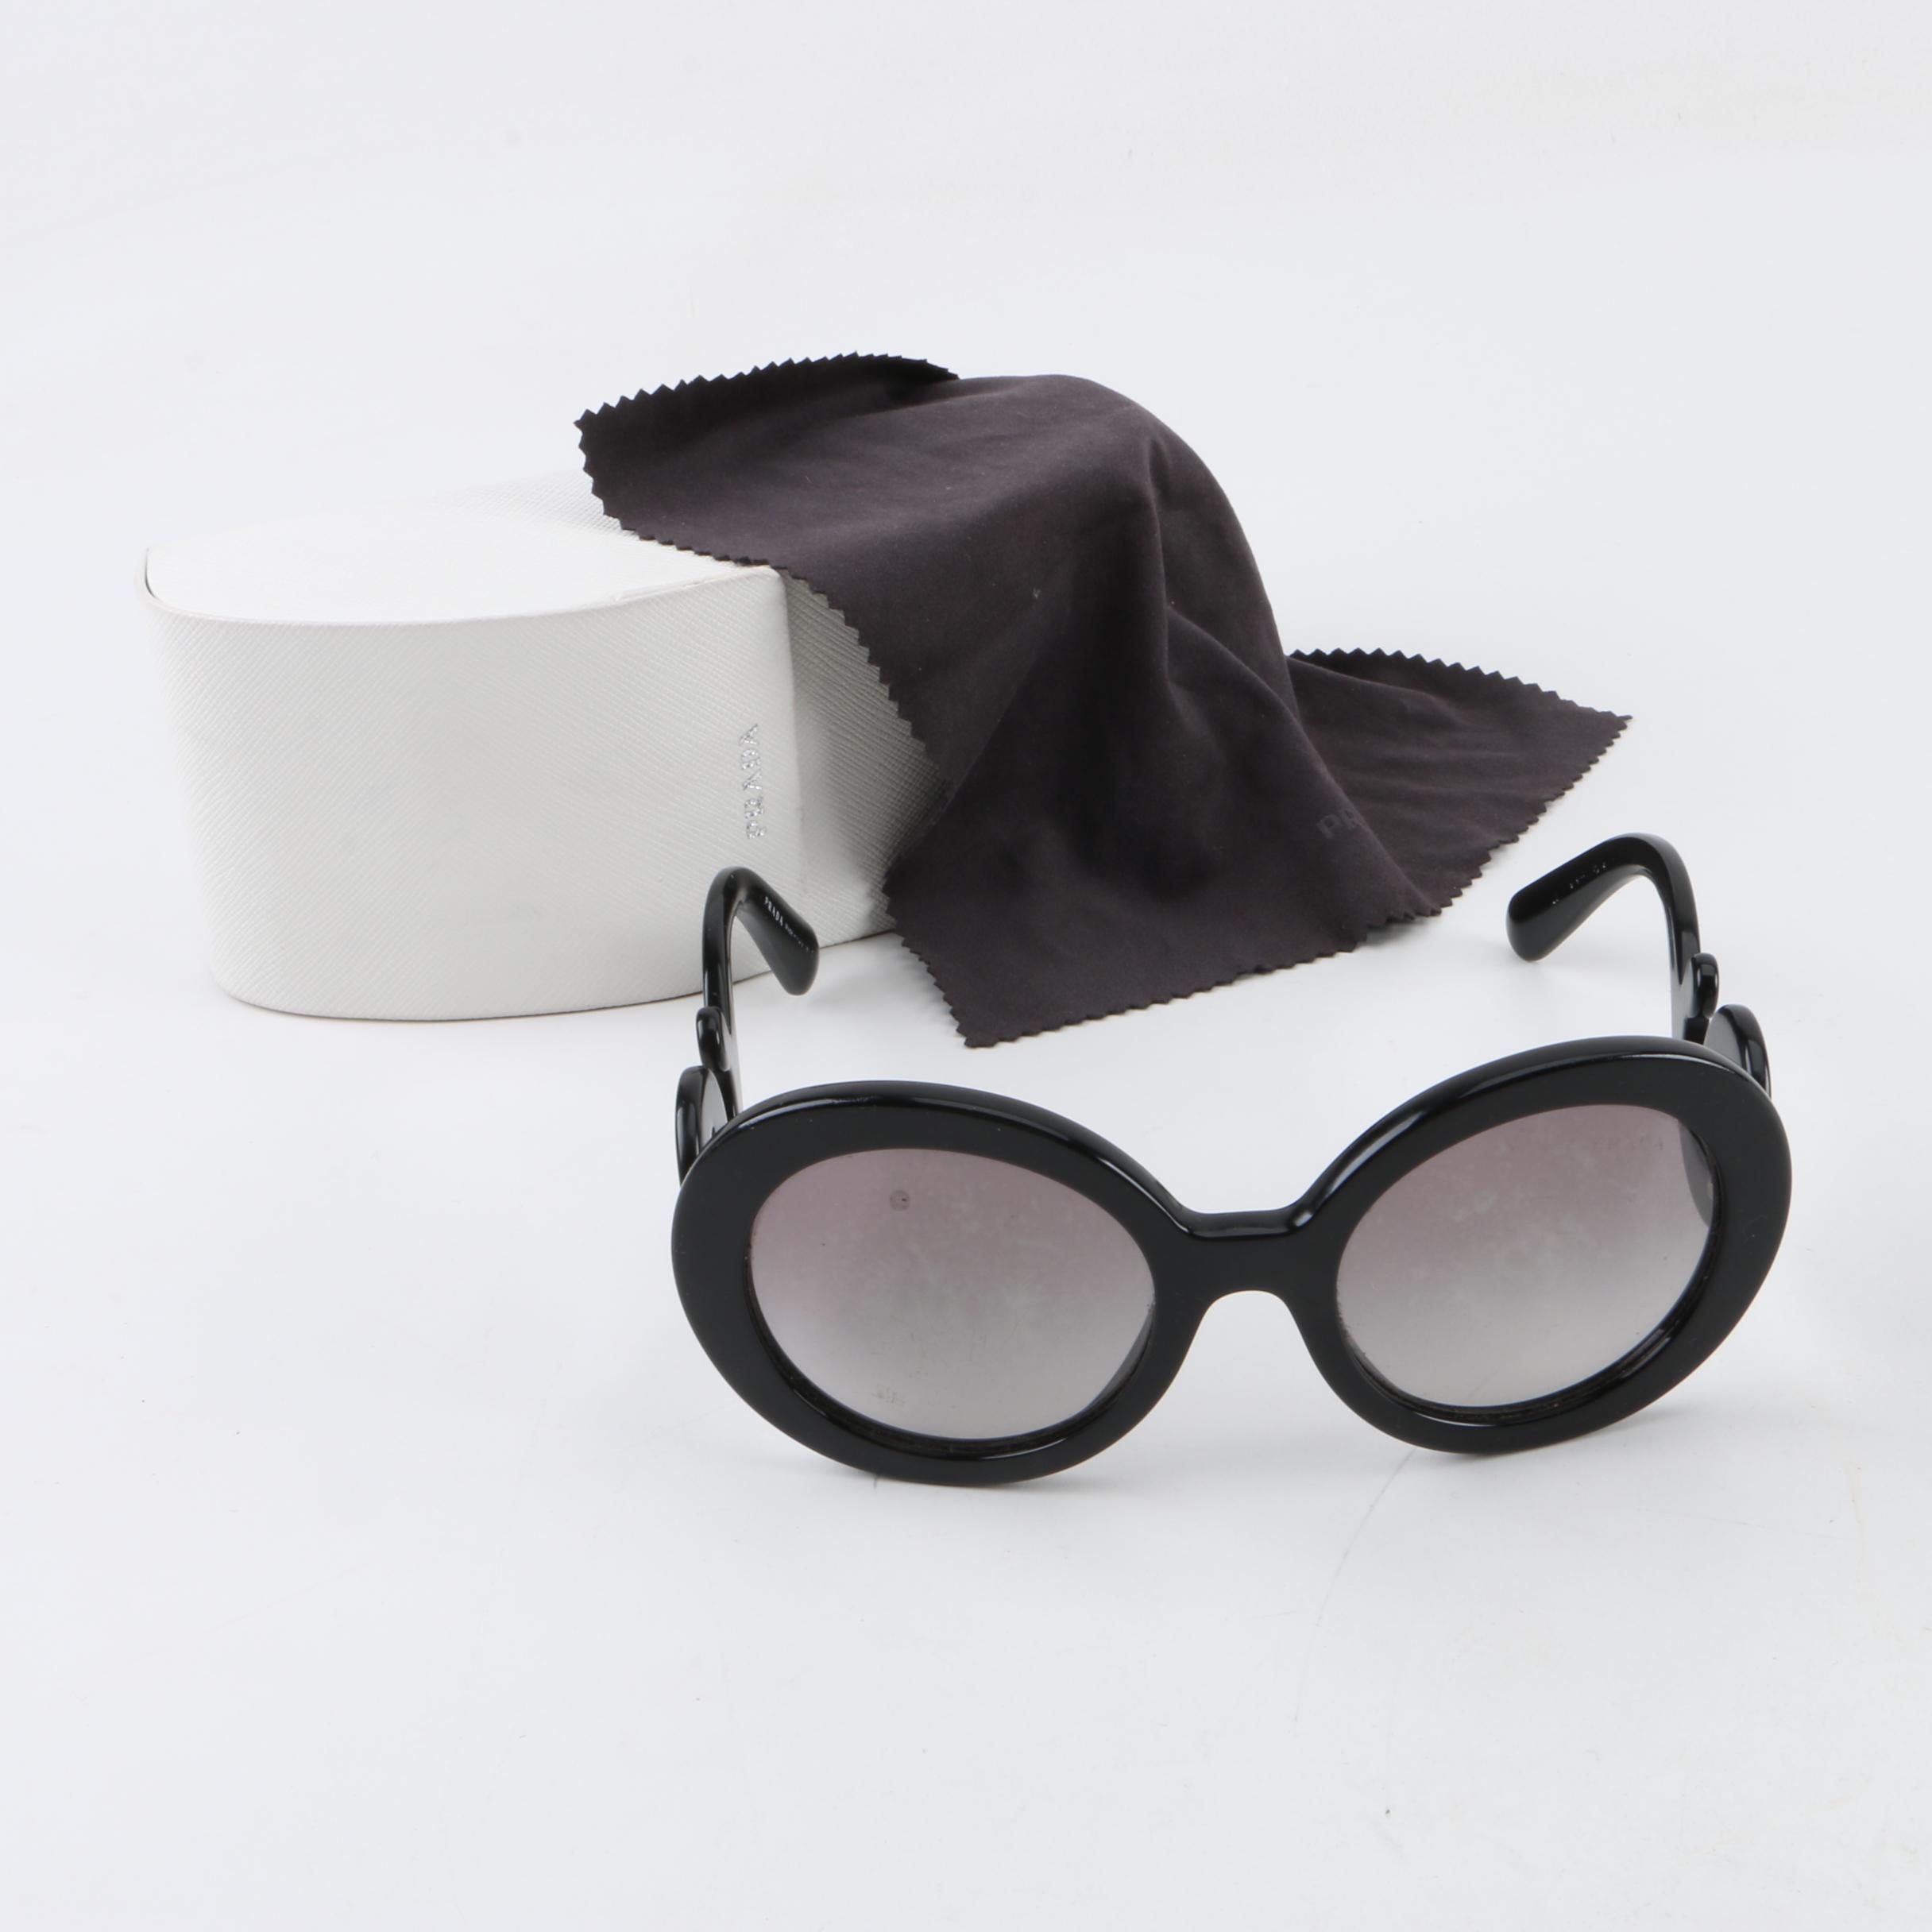 d7d0134175 ... spain prada black baroque sunglasses with case a1ff6 cc241